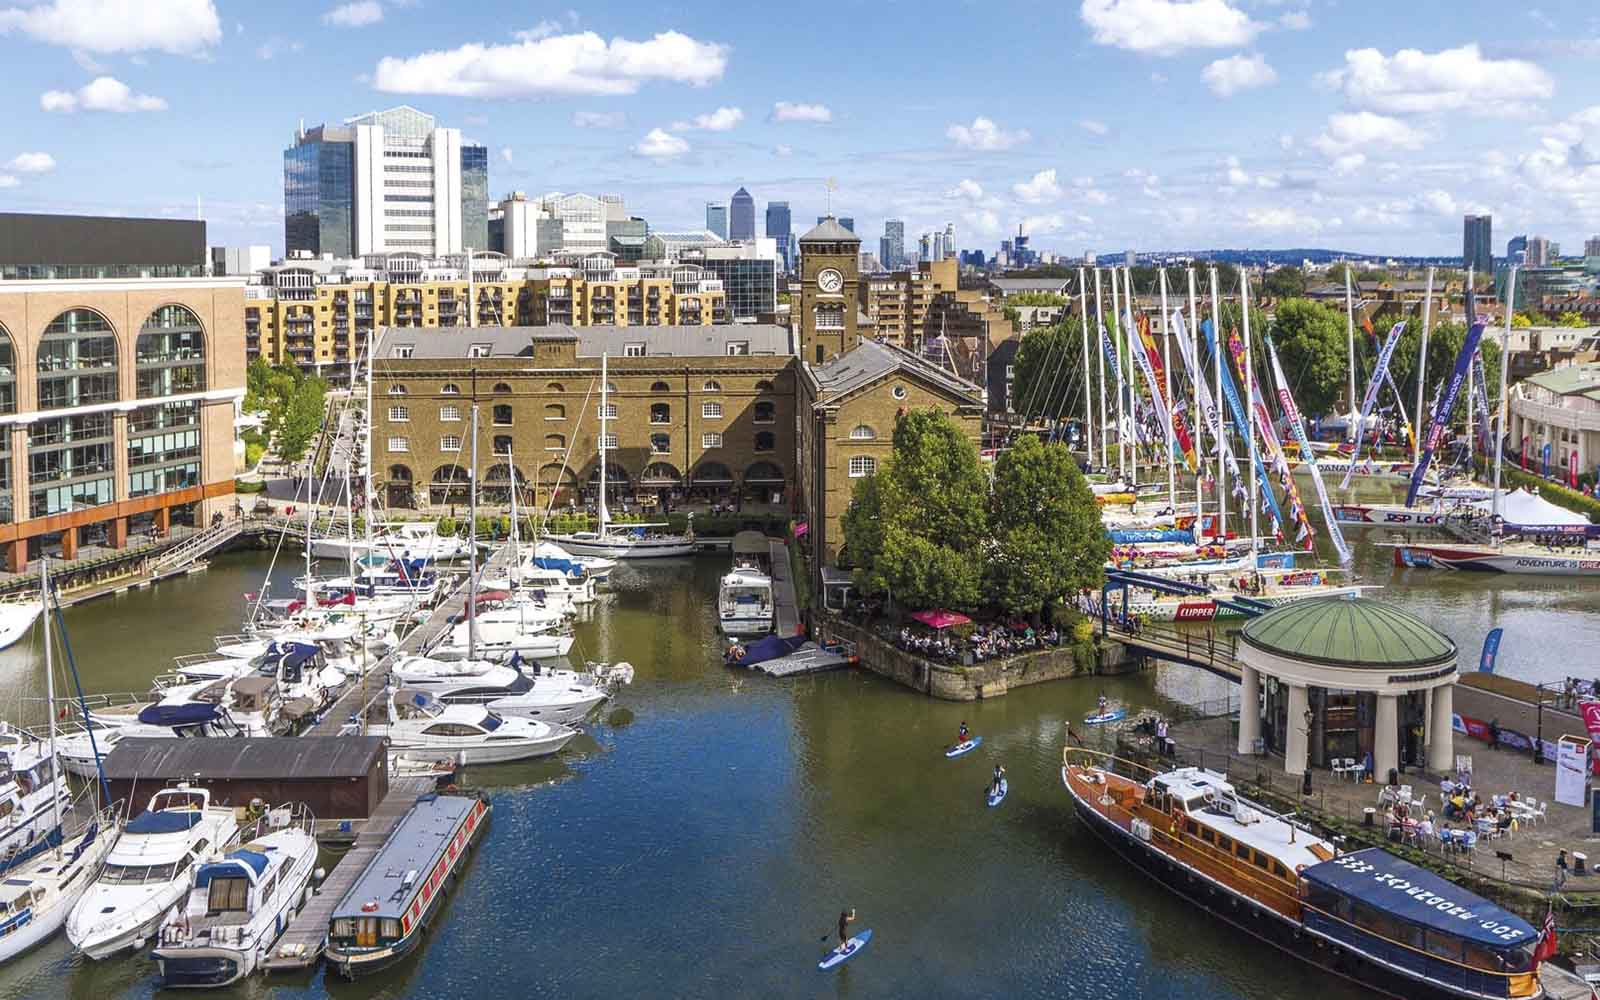 St. Kats Docks - boat shopping